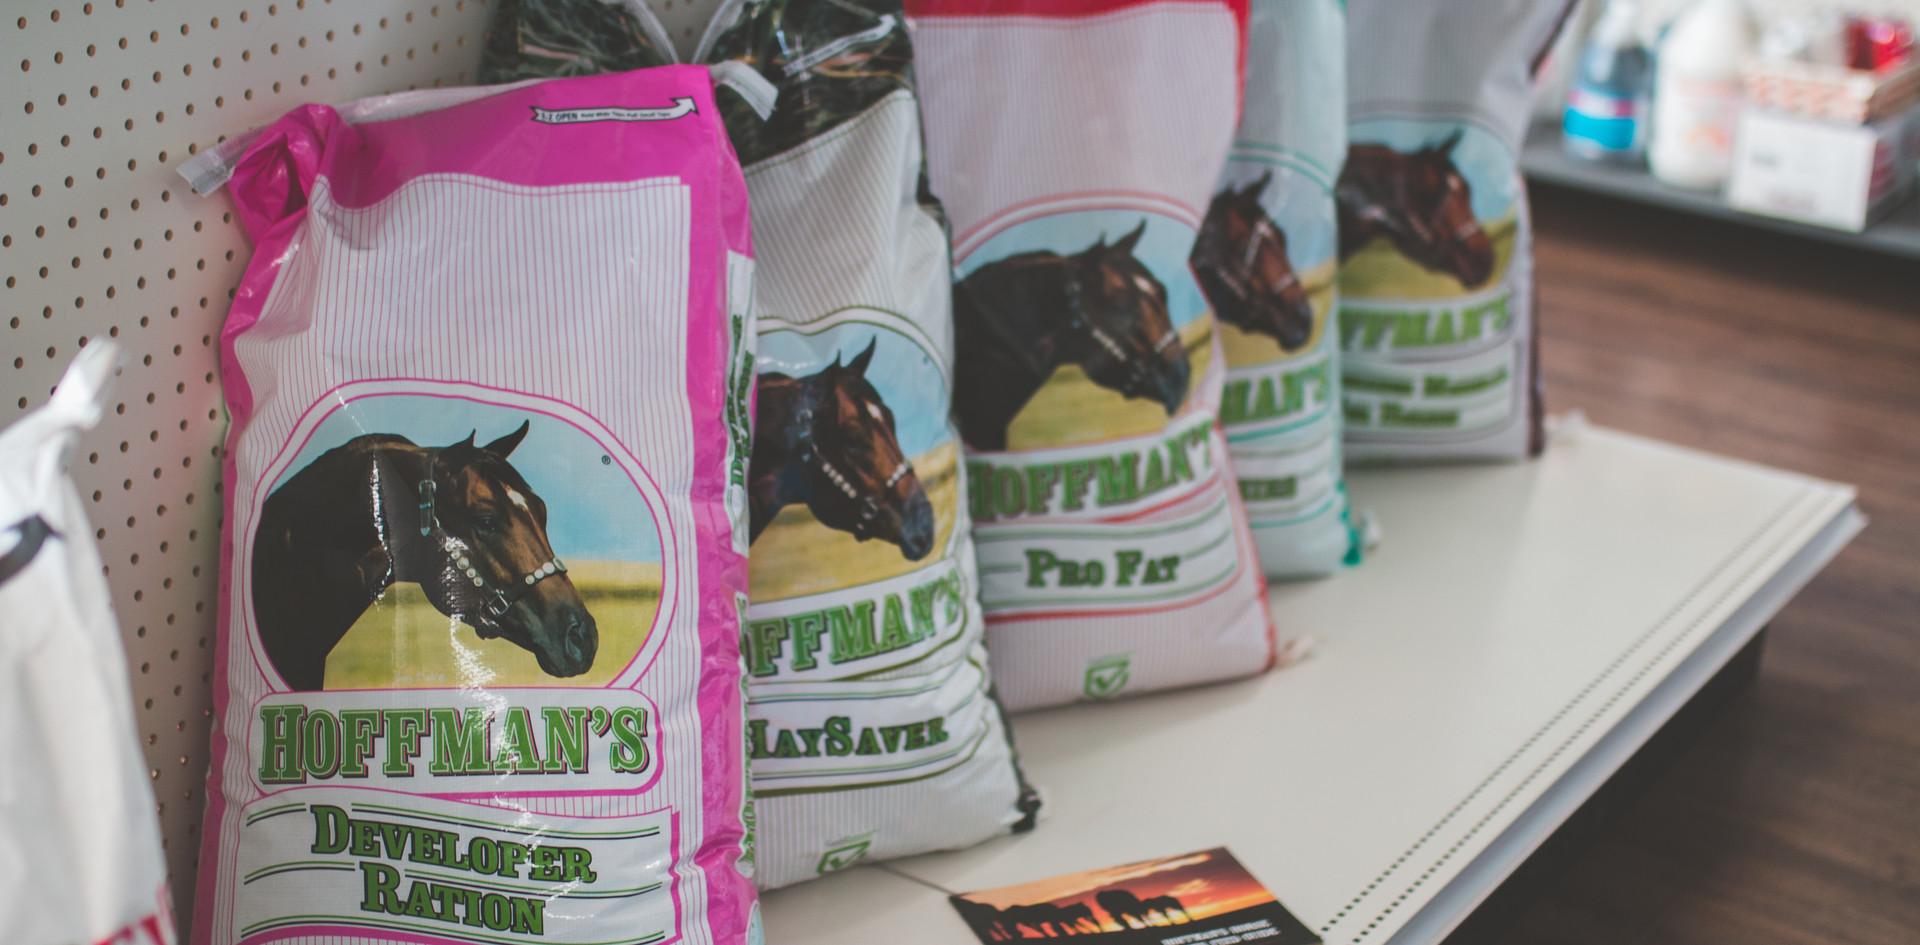 Hoffman's Horse Feed